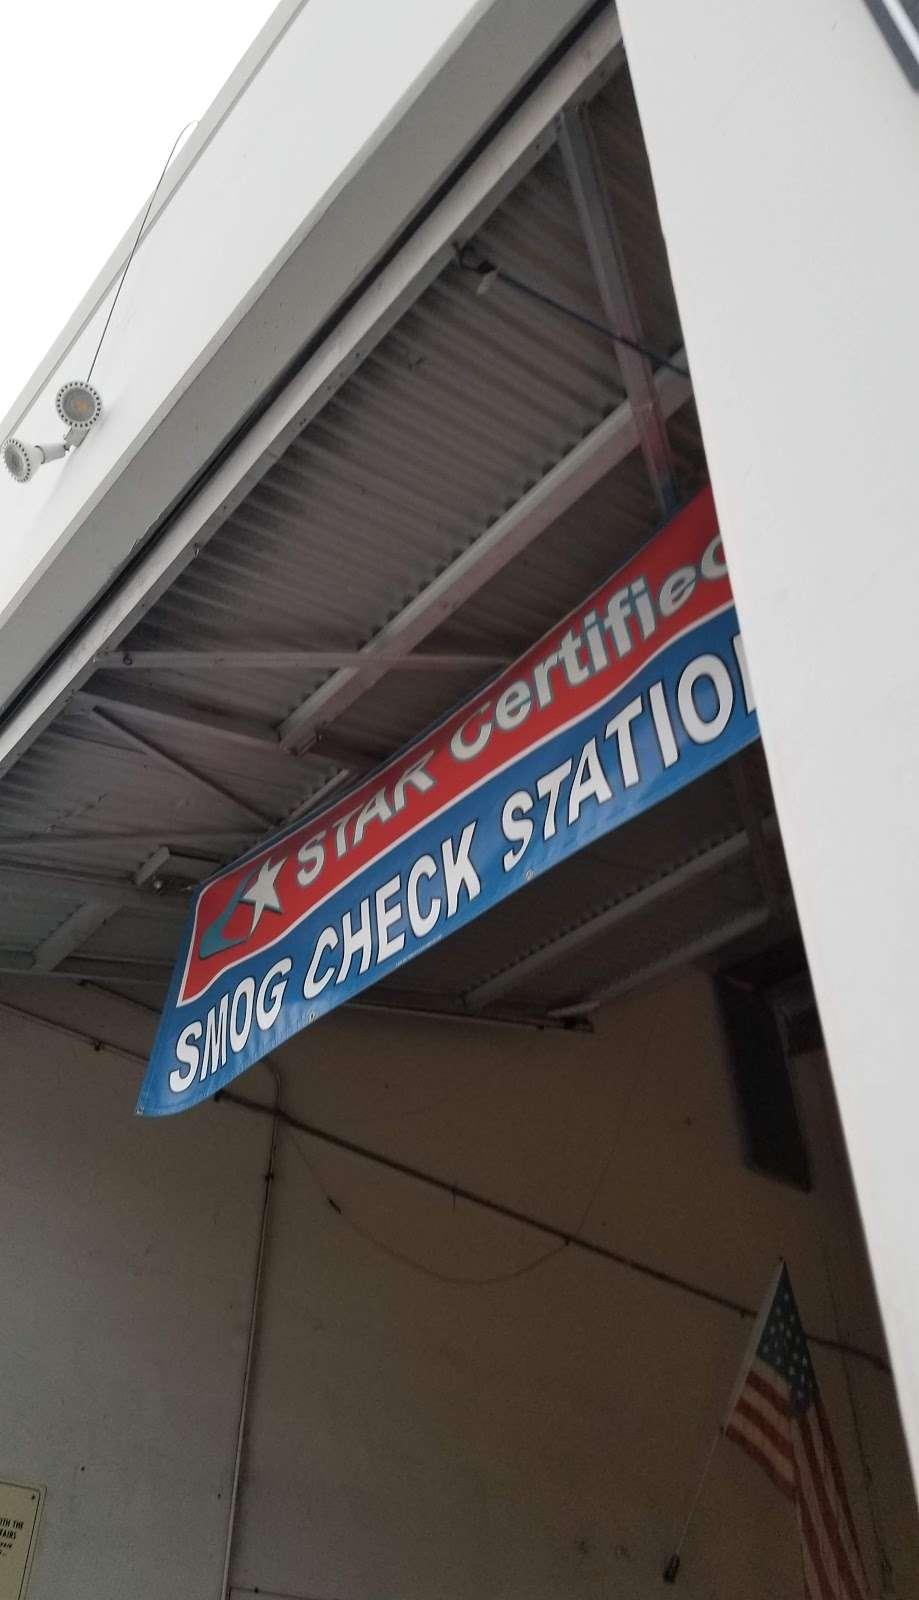 South Bay Smog 29.75 Test Only Star Station - car repair  | Photo 4 of 8 | Address: 2675 Skypark Dr UNIT 104, Torrance, CA 90505, USA | Phone: (310) 530-8576